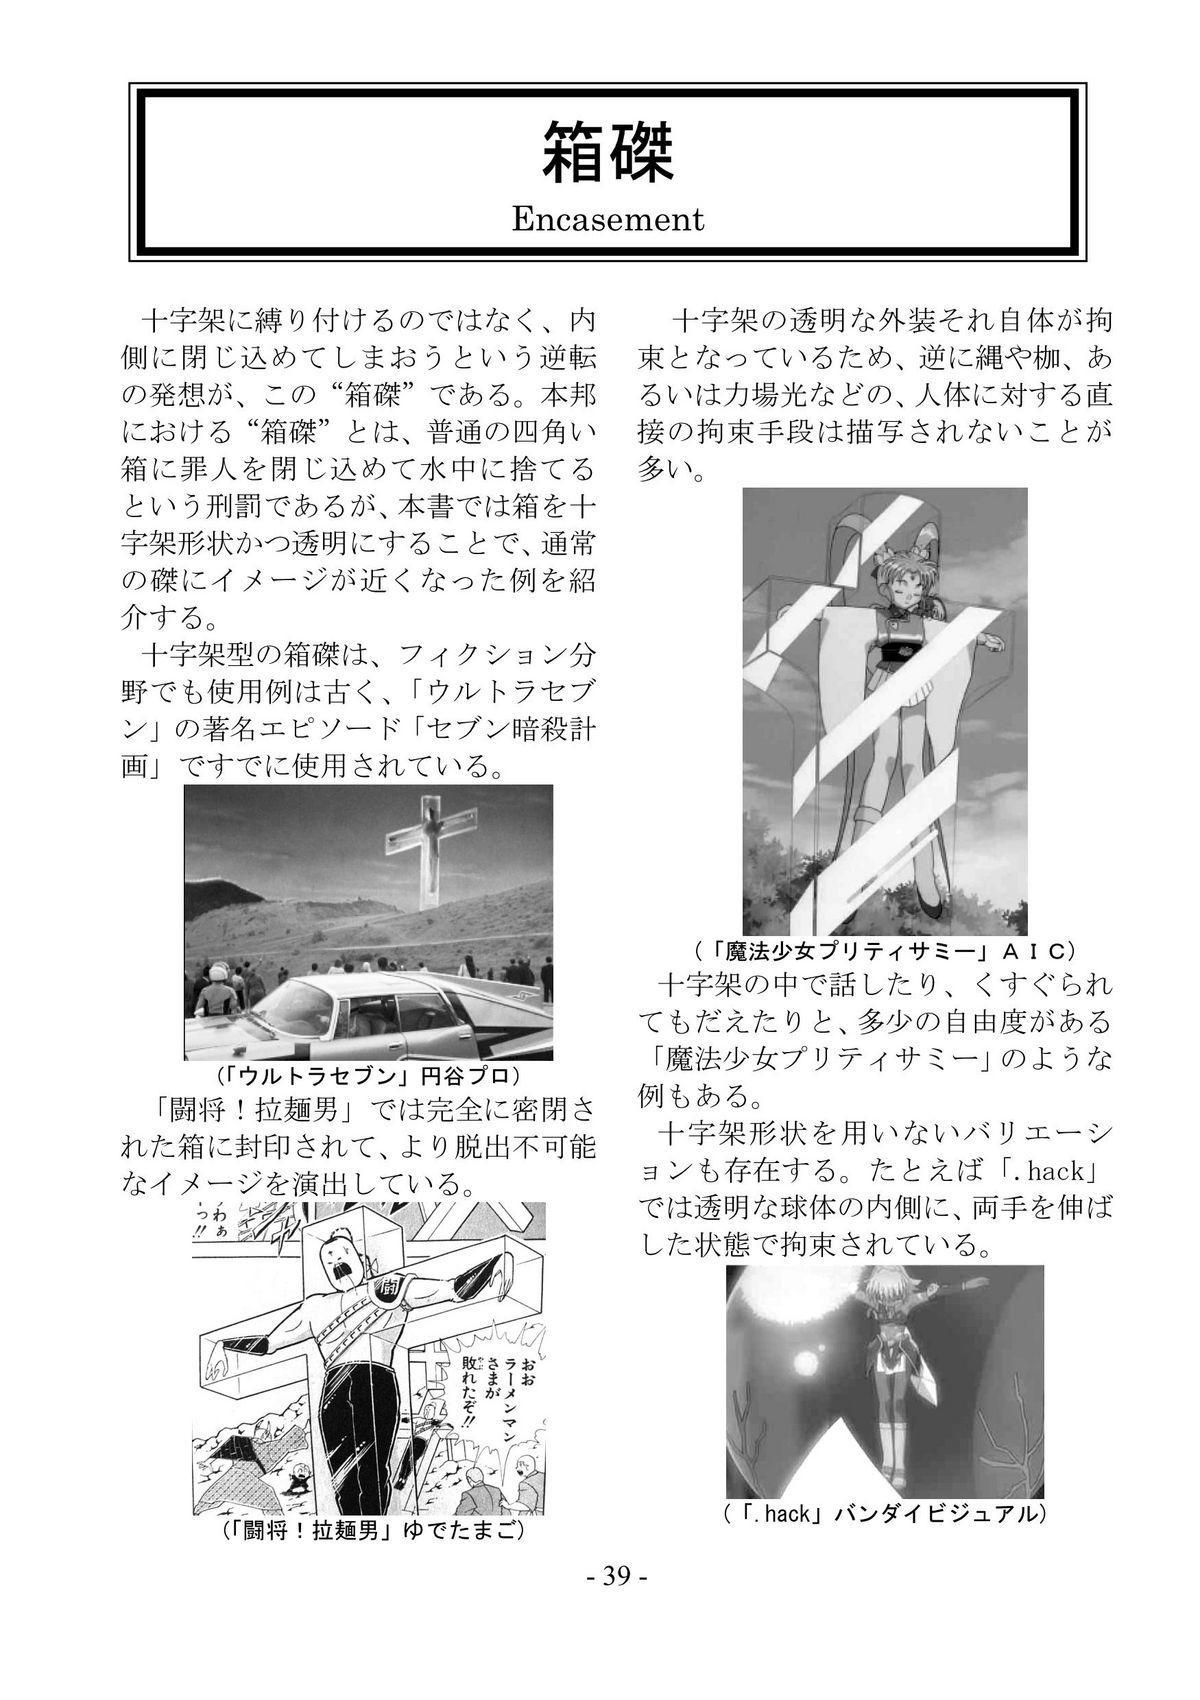 encyclopedia of crucifixion 39